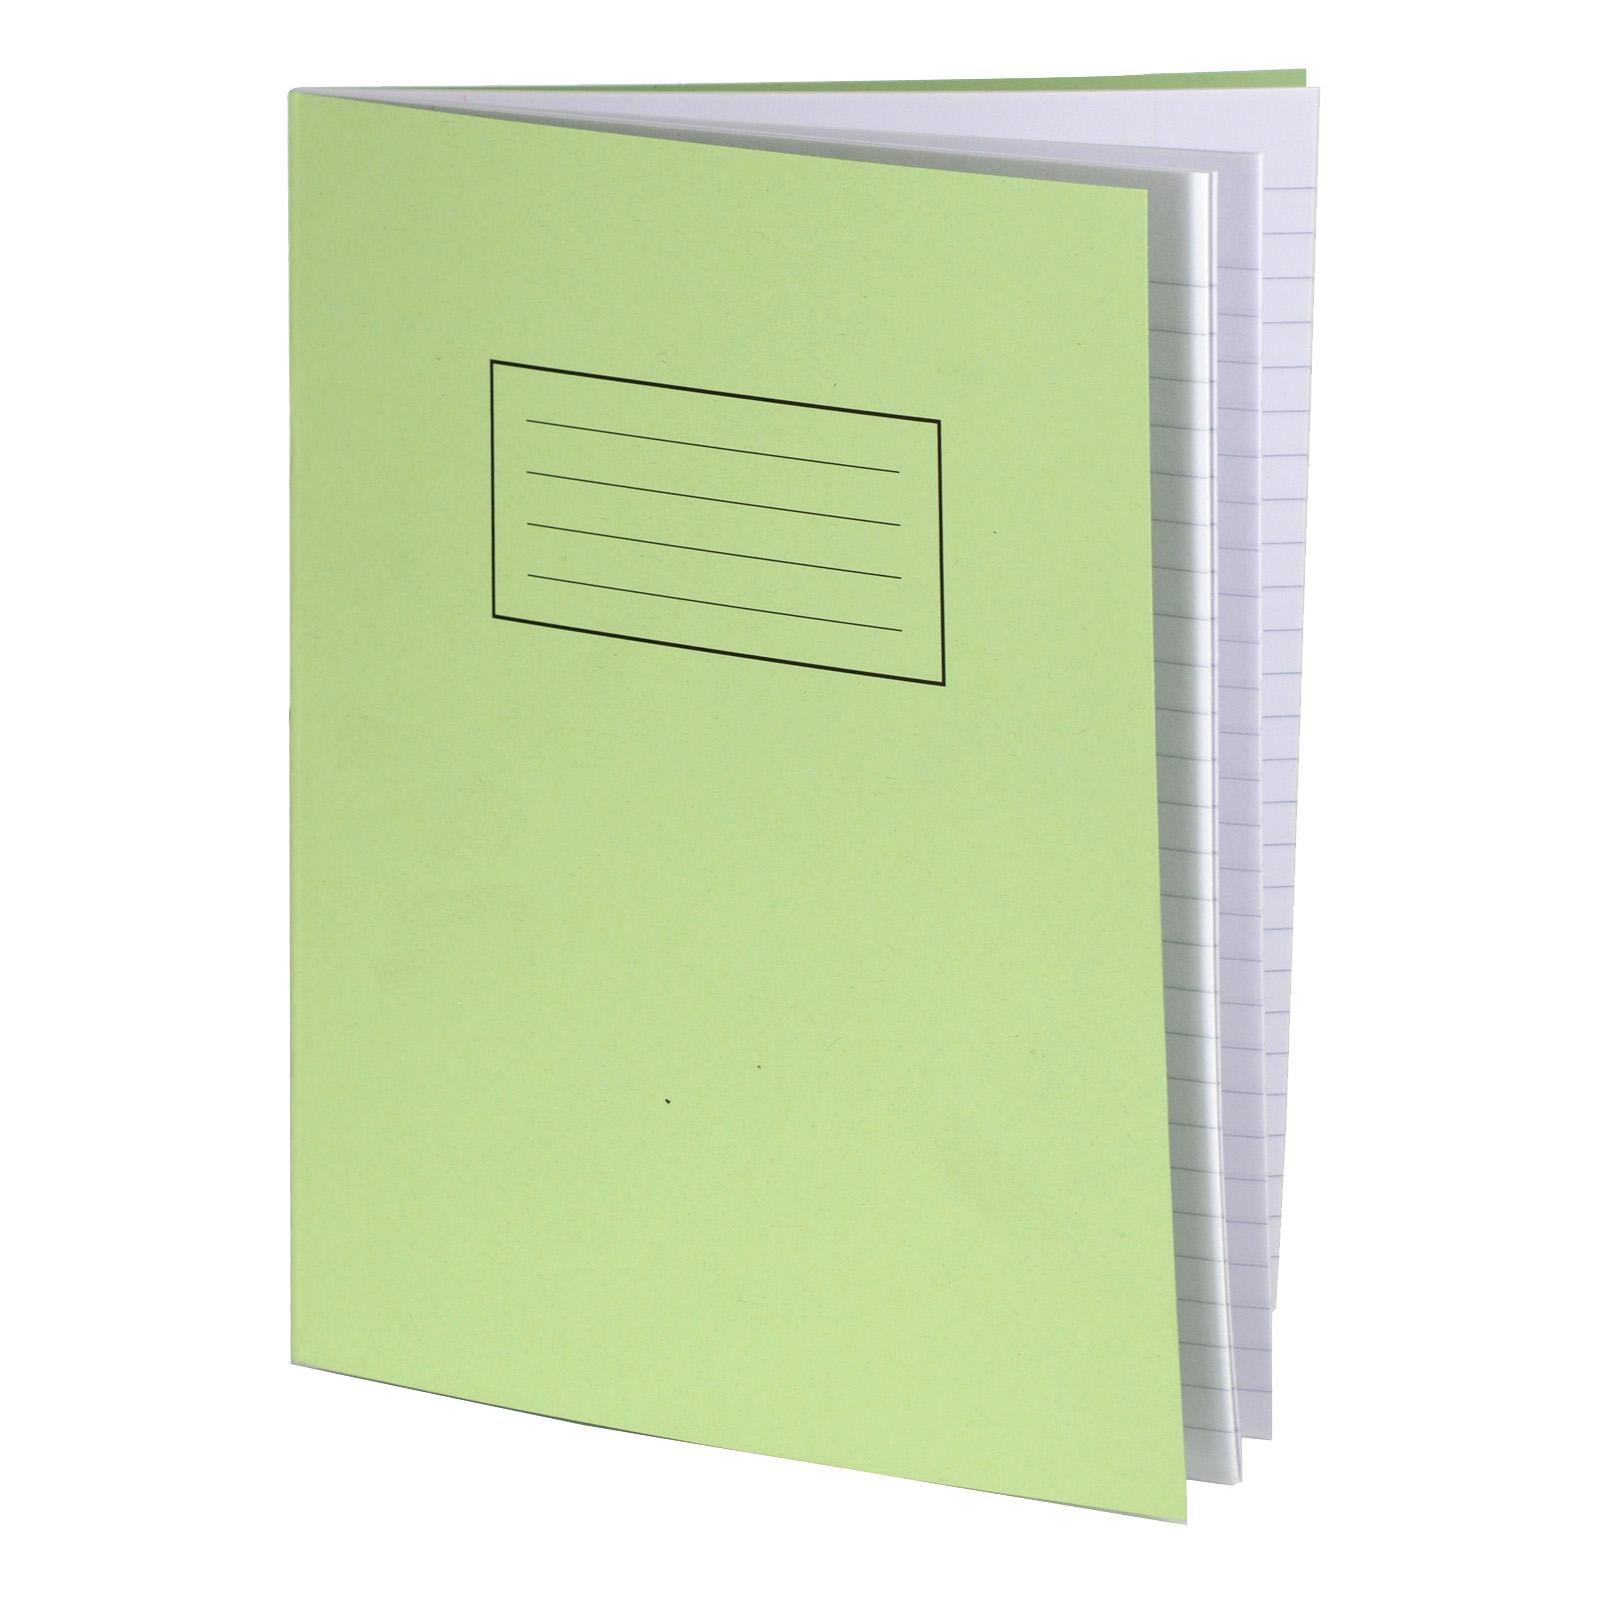 SILVINE EXERCISE BOOK 9X7 RULED X10